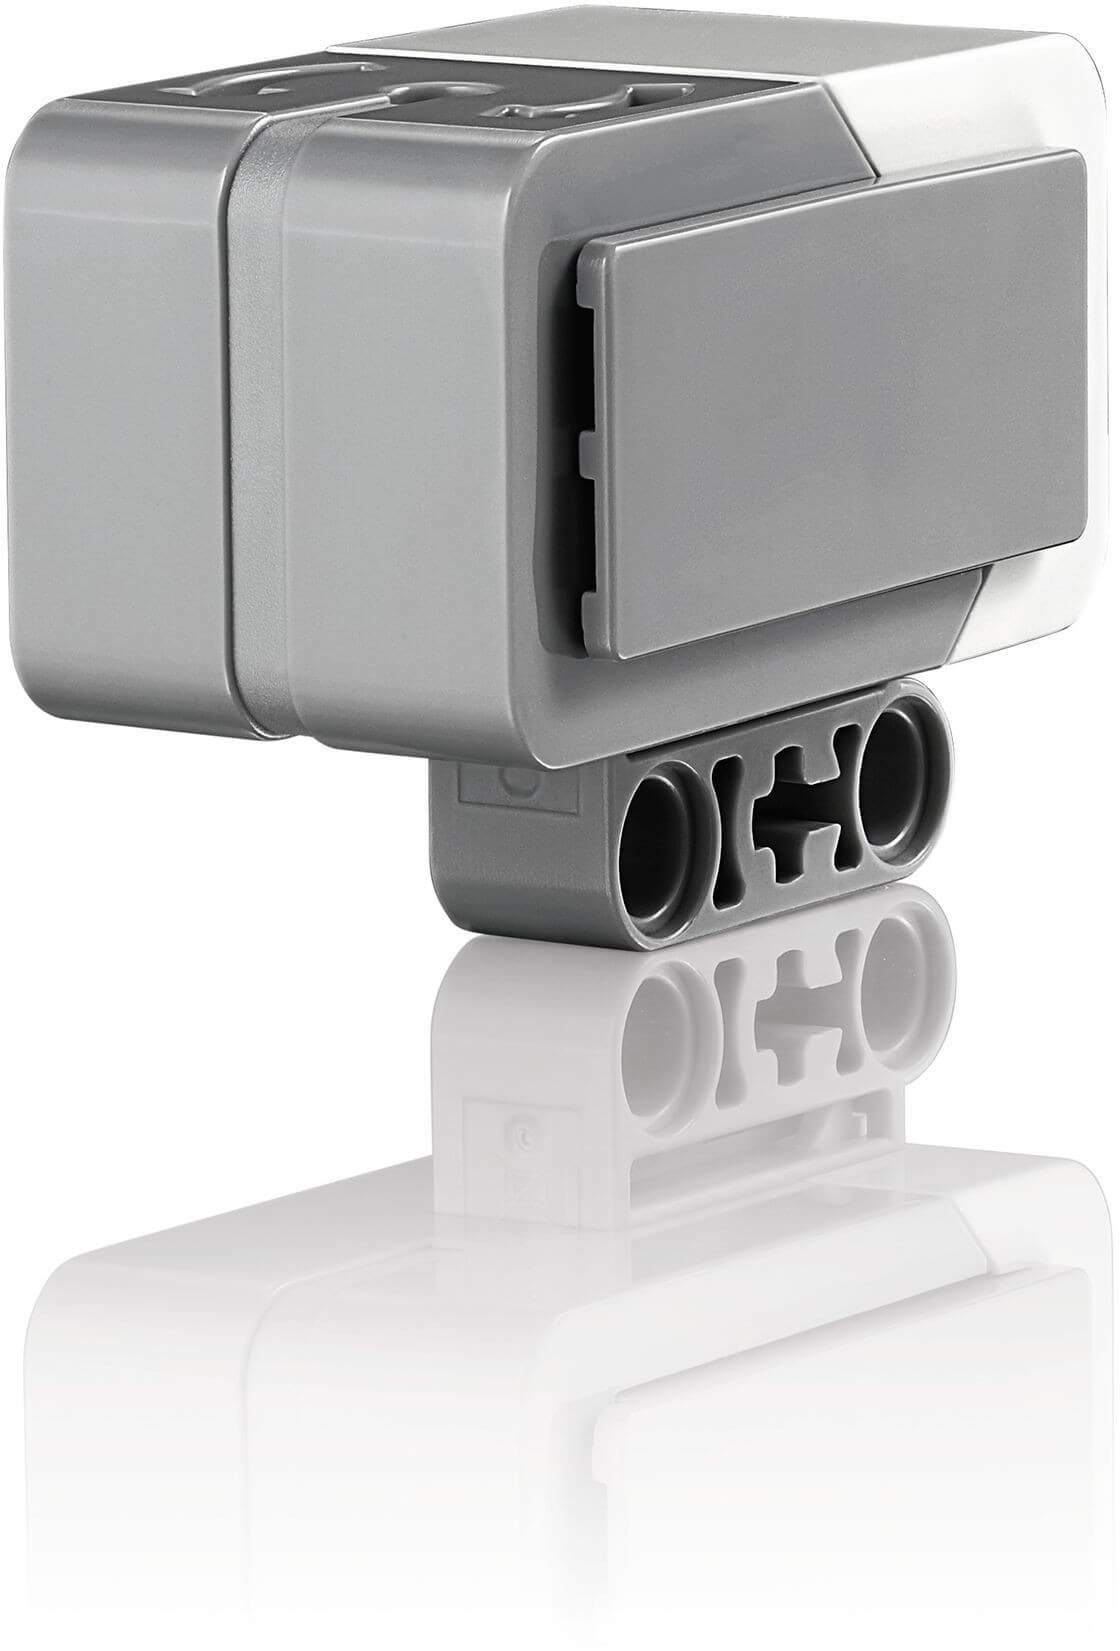 Mua đồ chơi LEGO 45505 - LEGO Mindstorms 45505 - Cảm Biến Thăng Bằng Gyro Sensor (LEGO 45505 EV3 Gyro Sensor)